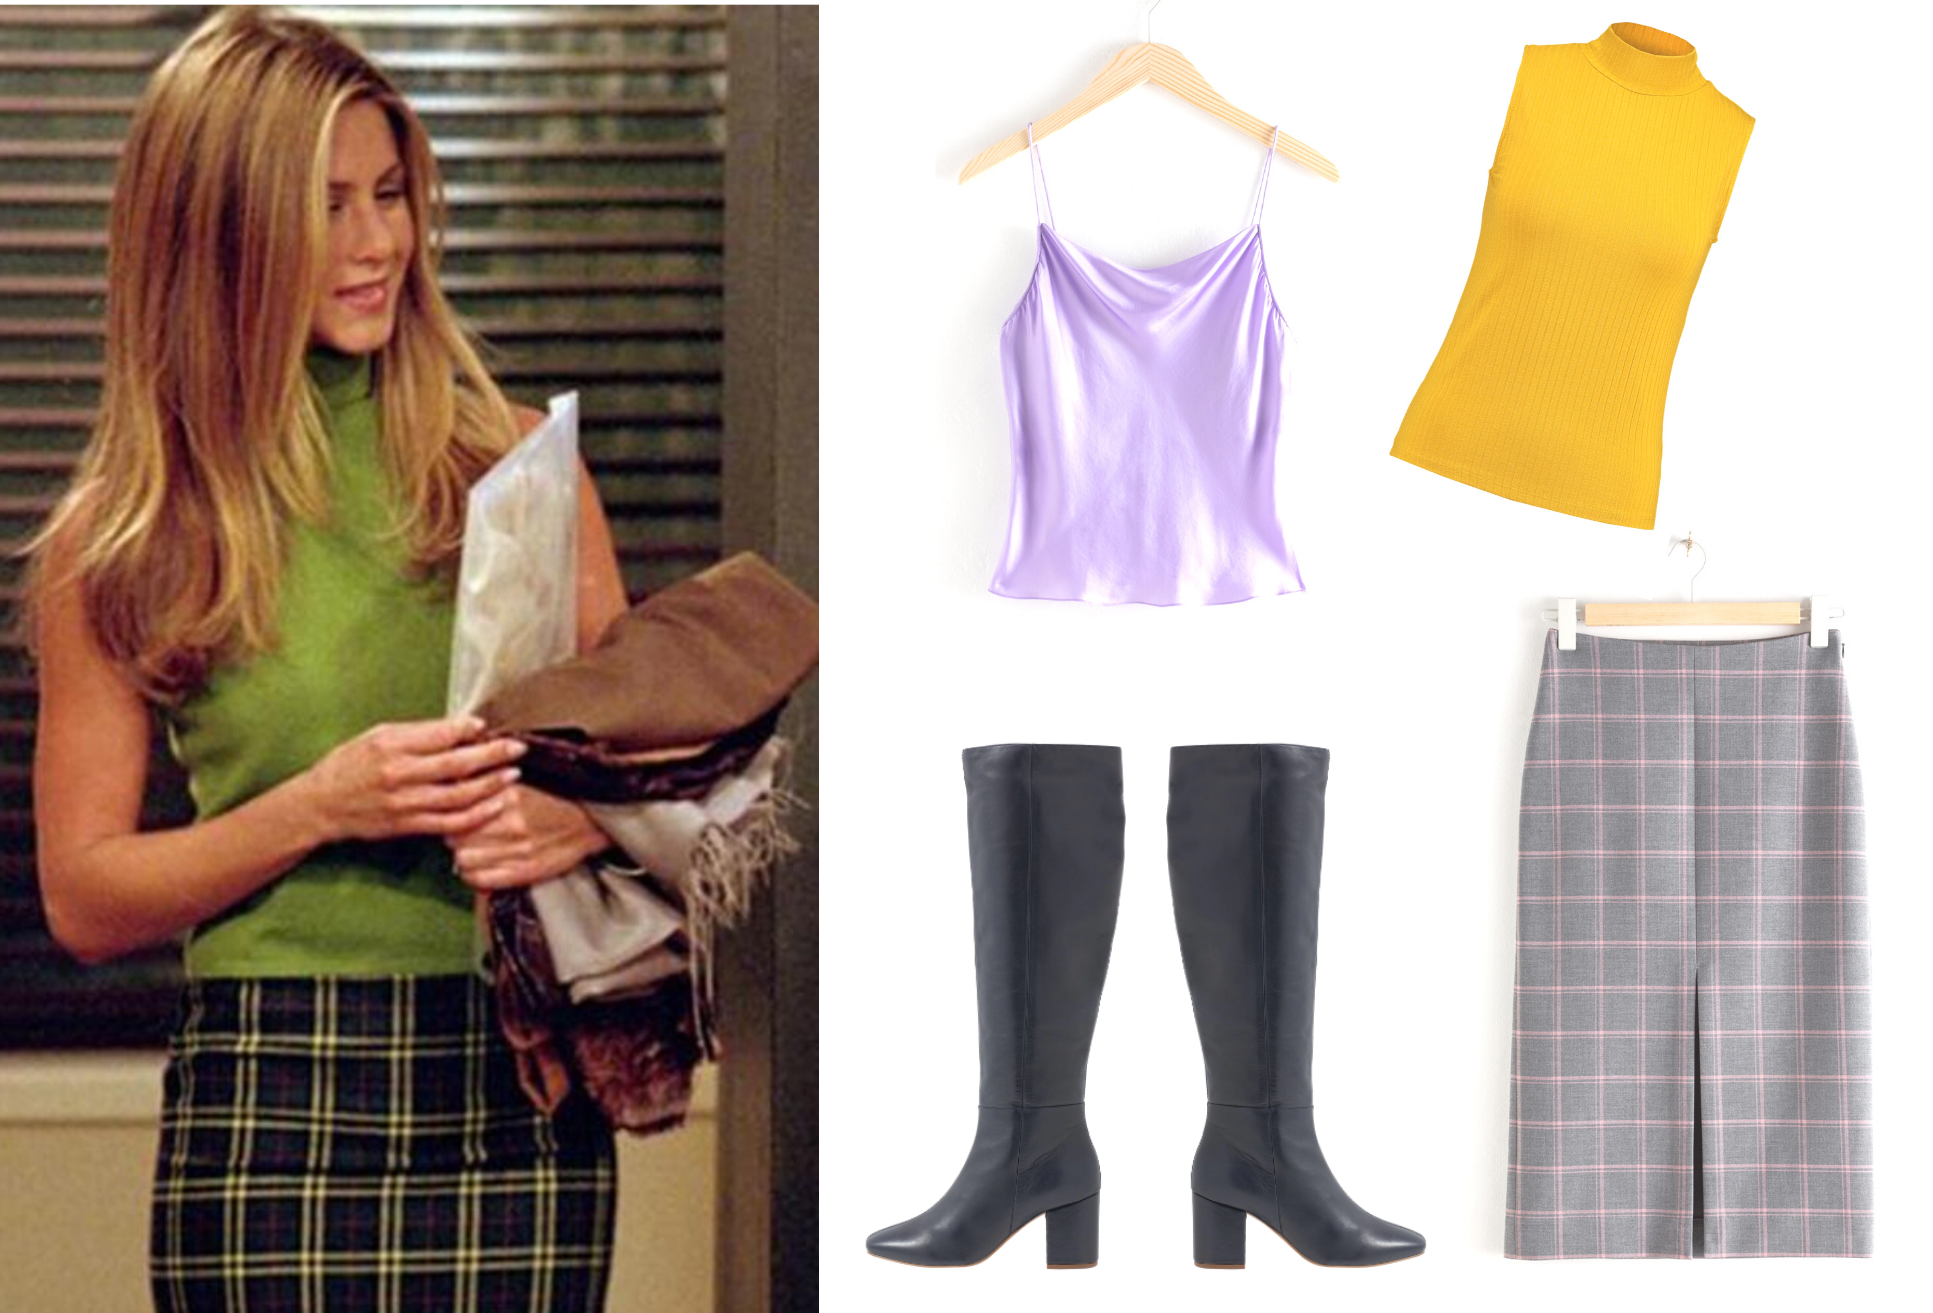 Rachel Green, fashion, tøj, Friends, tv-serie, inspiration. (Kollage: MY DAILY SPACE)